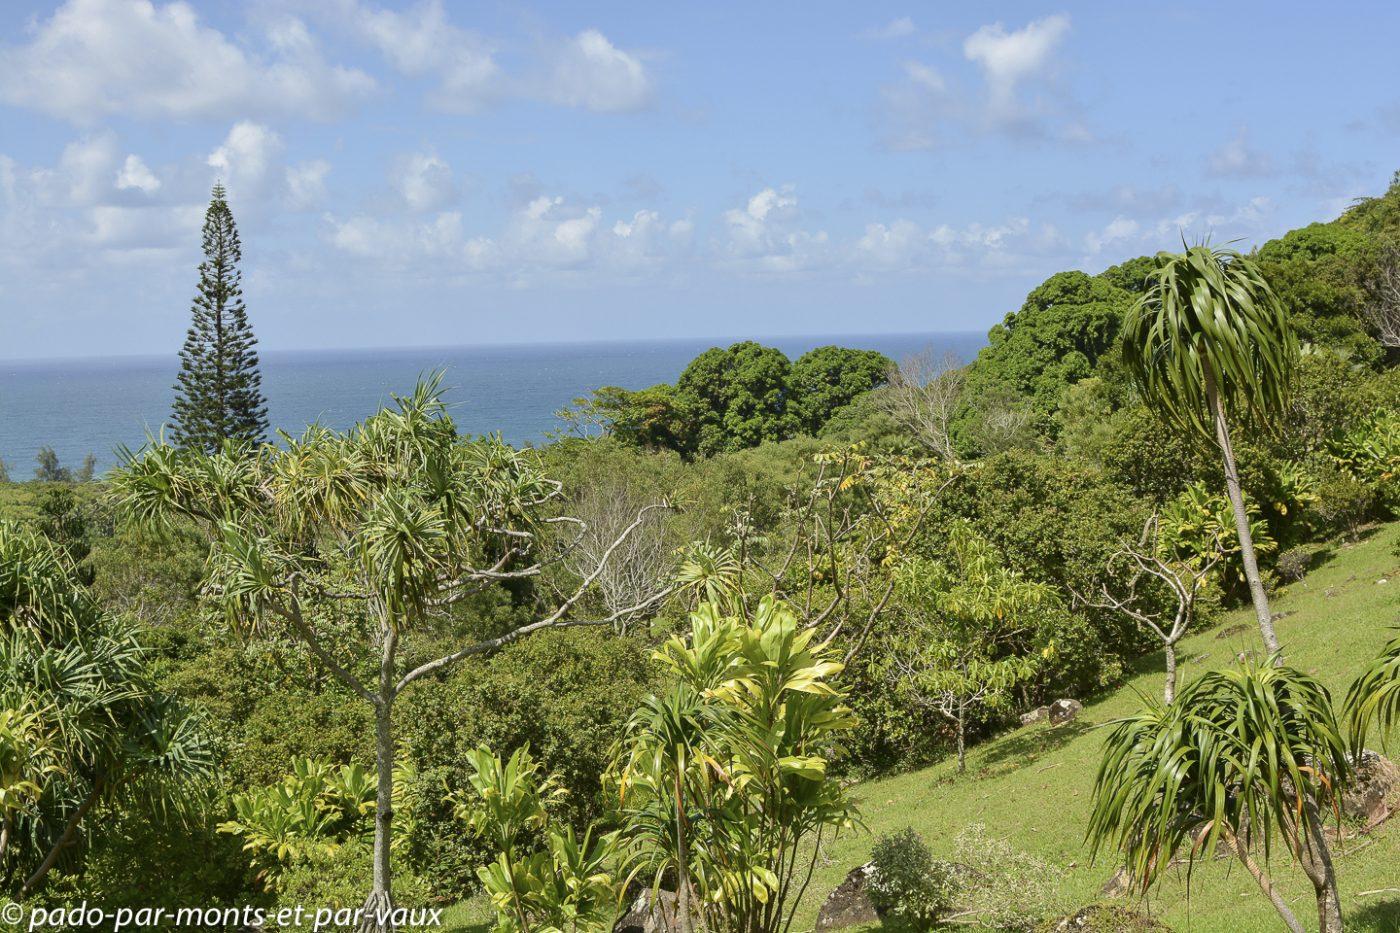 Kauai - Limahuli garden